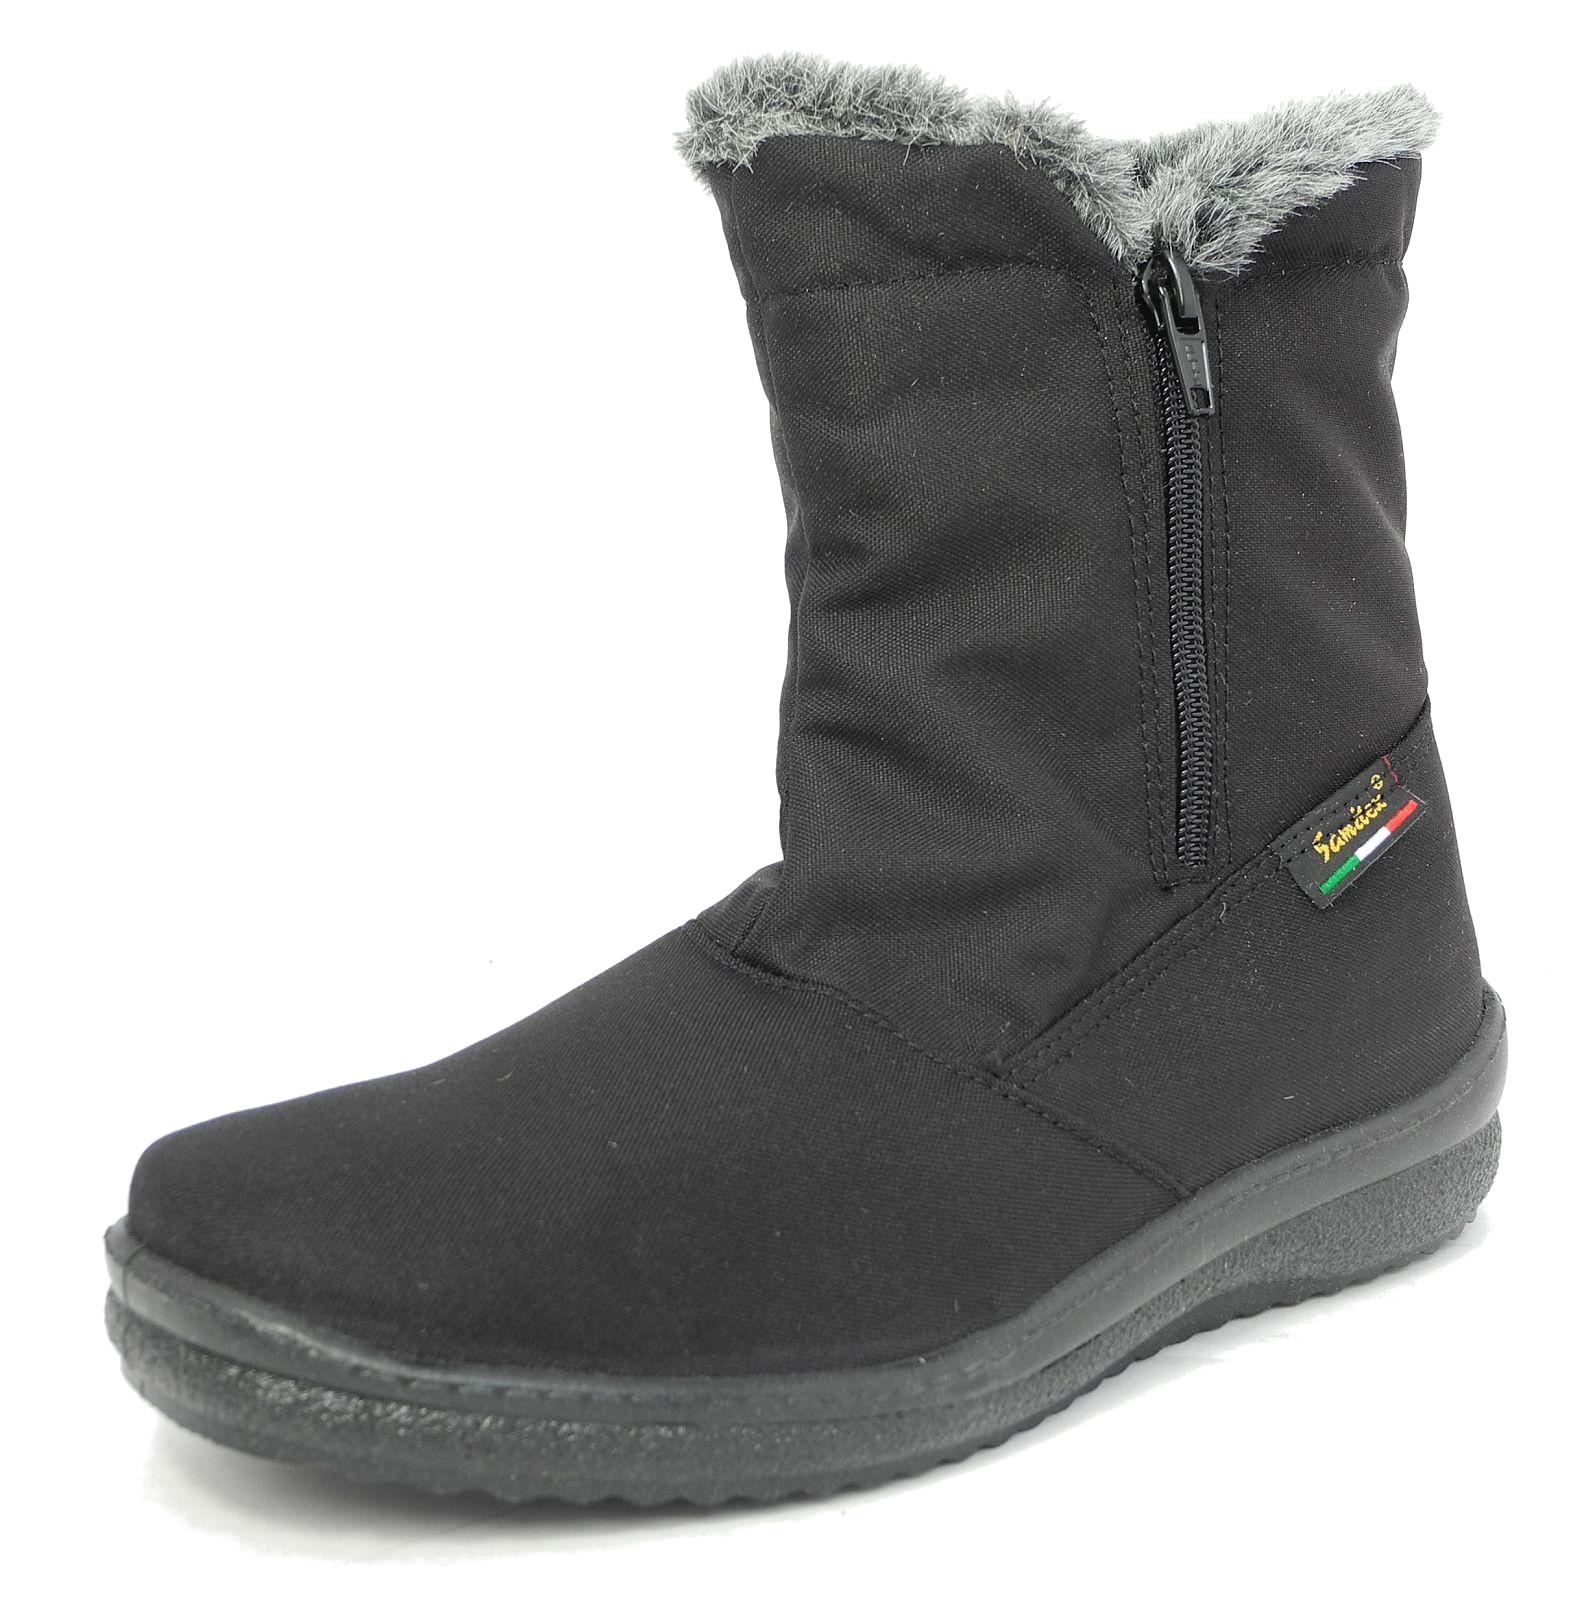 womens fur lined waterproof warm winter snow boots